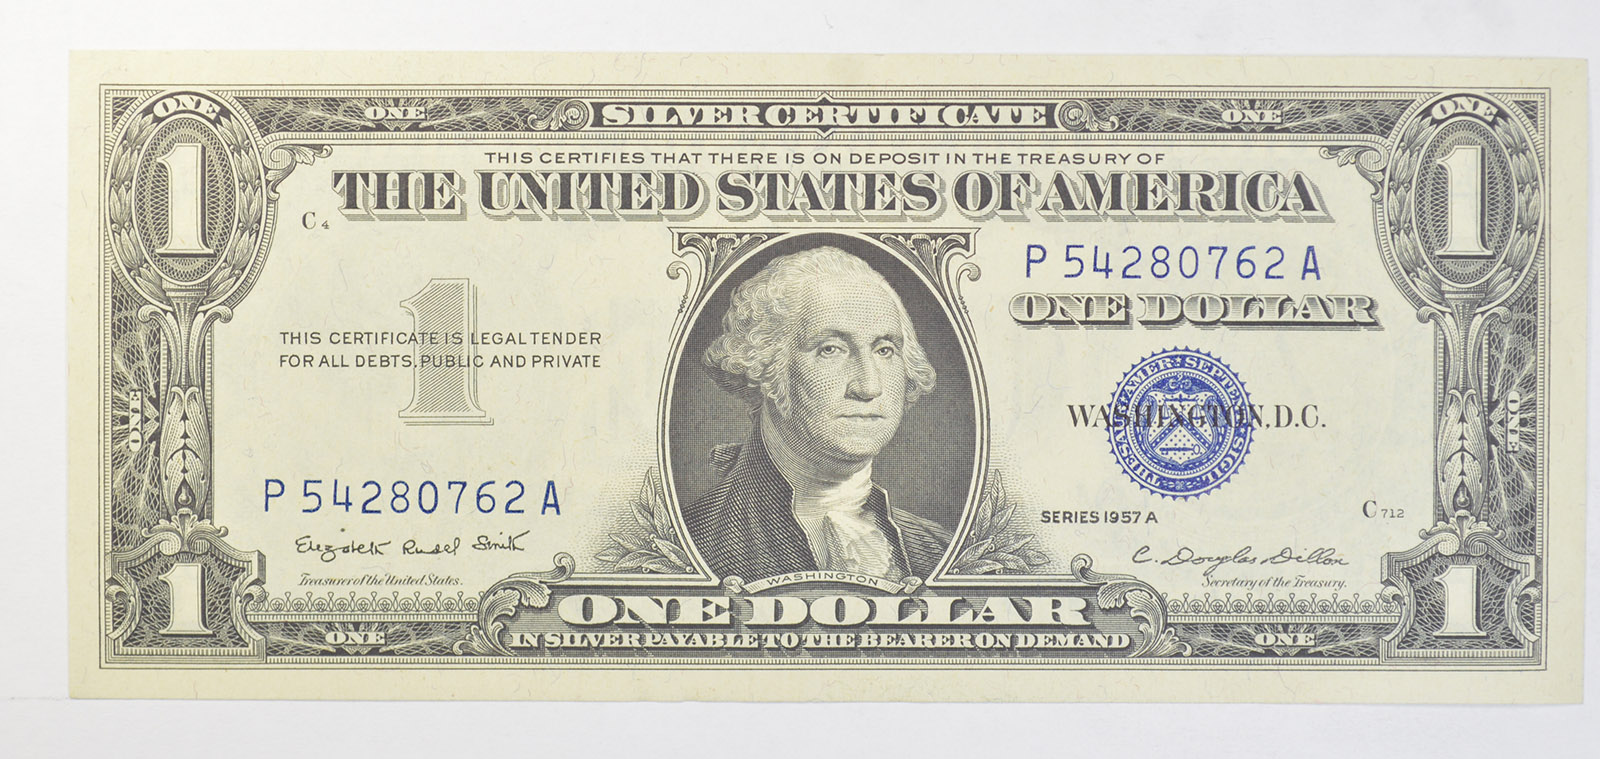 Douglas Dillon Sec Crisp Silver Certificate 1957 A High Grade